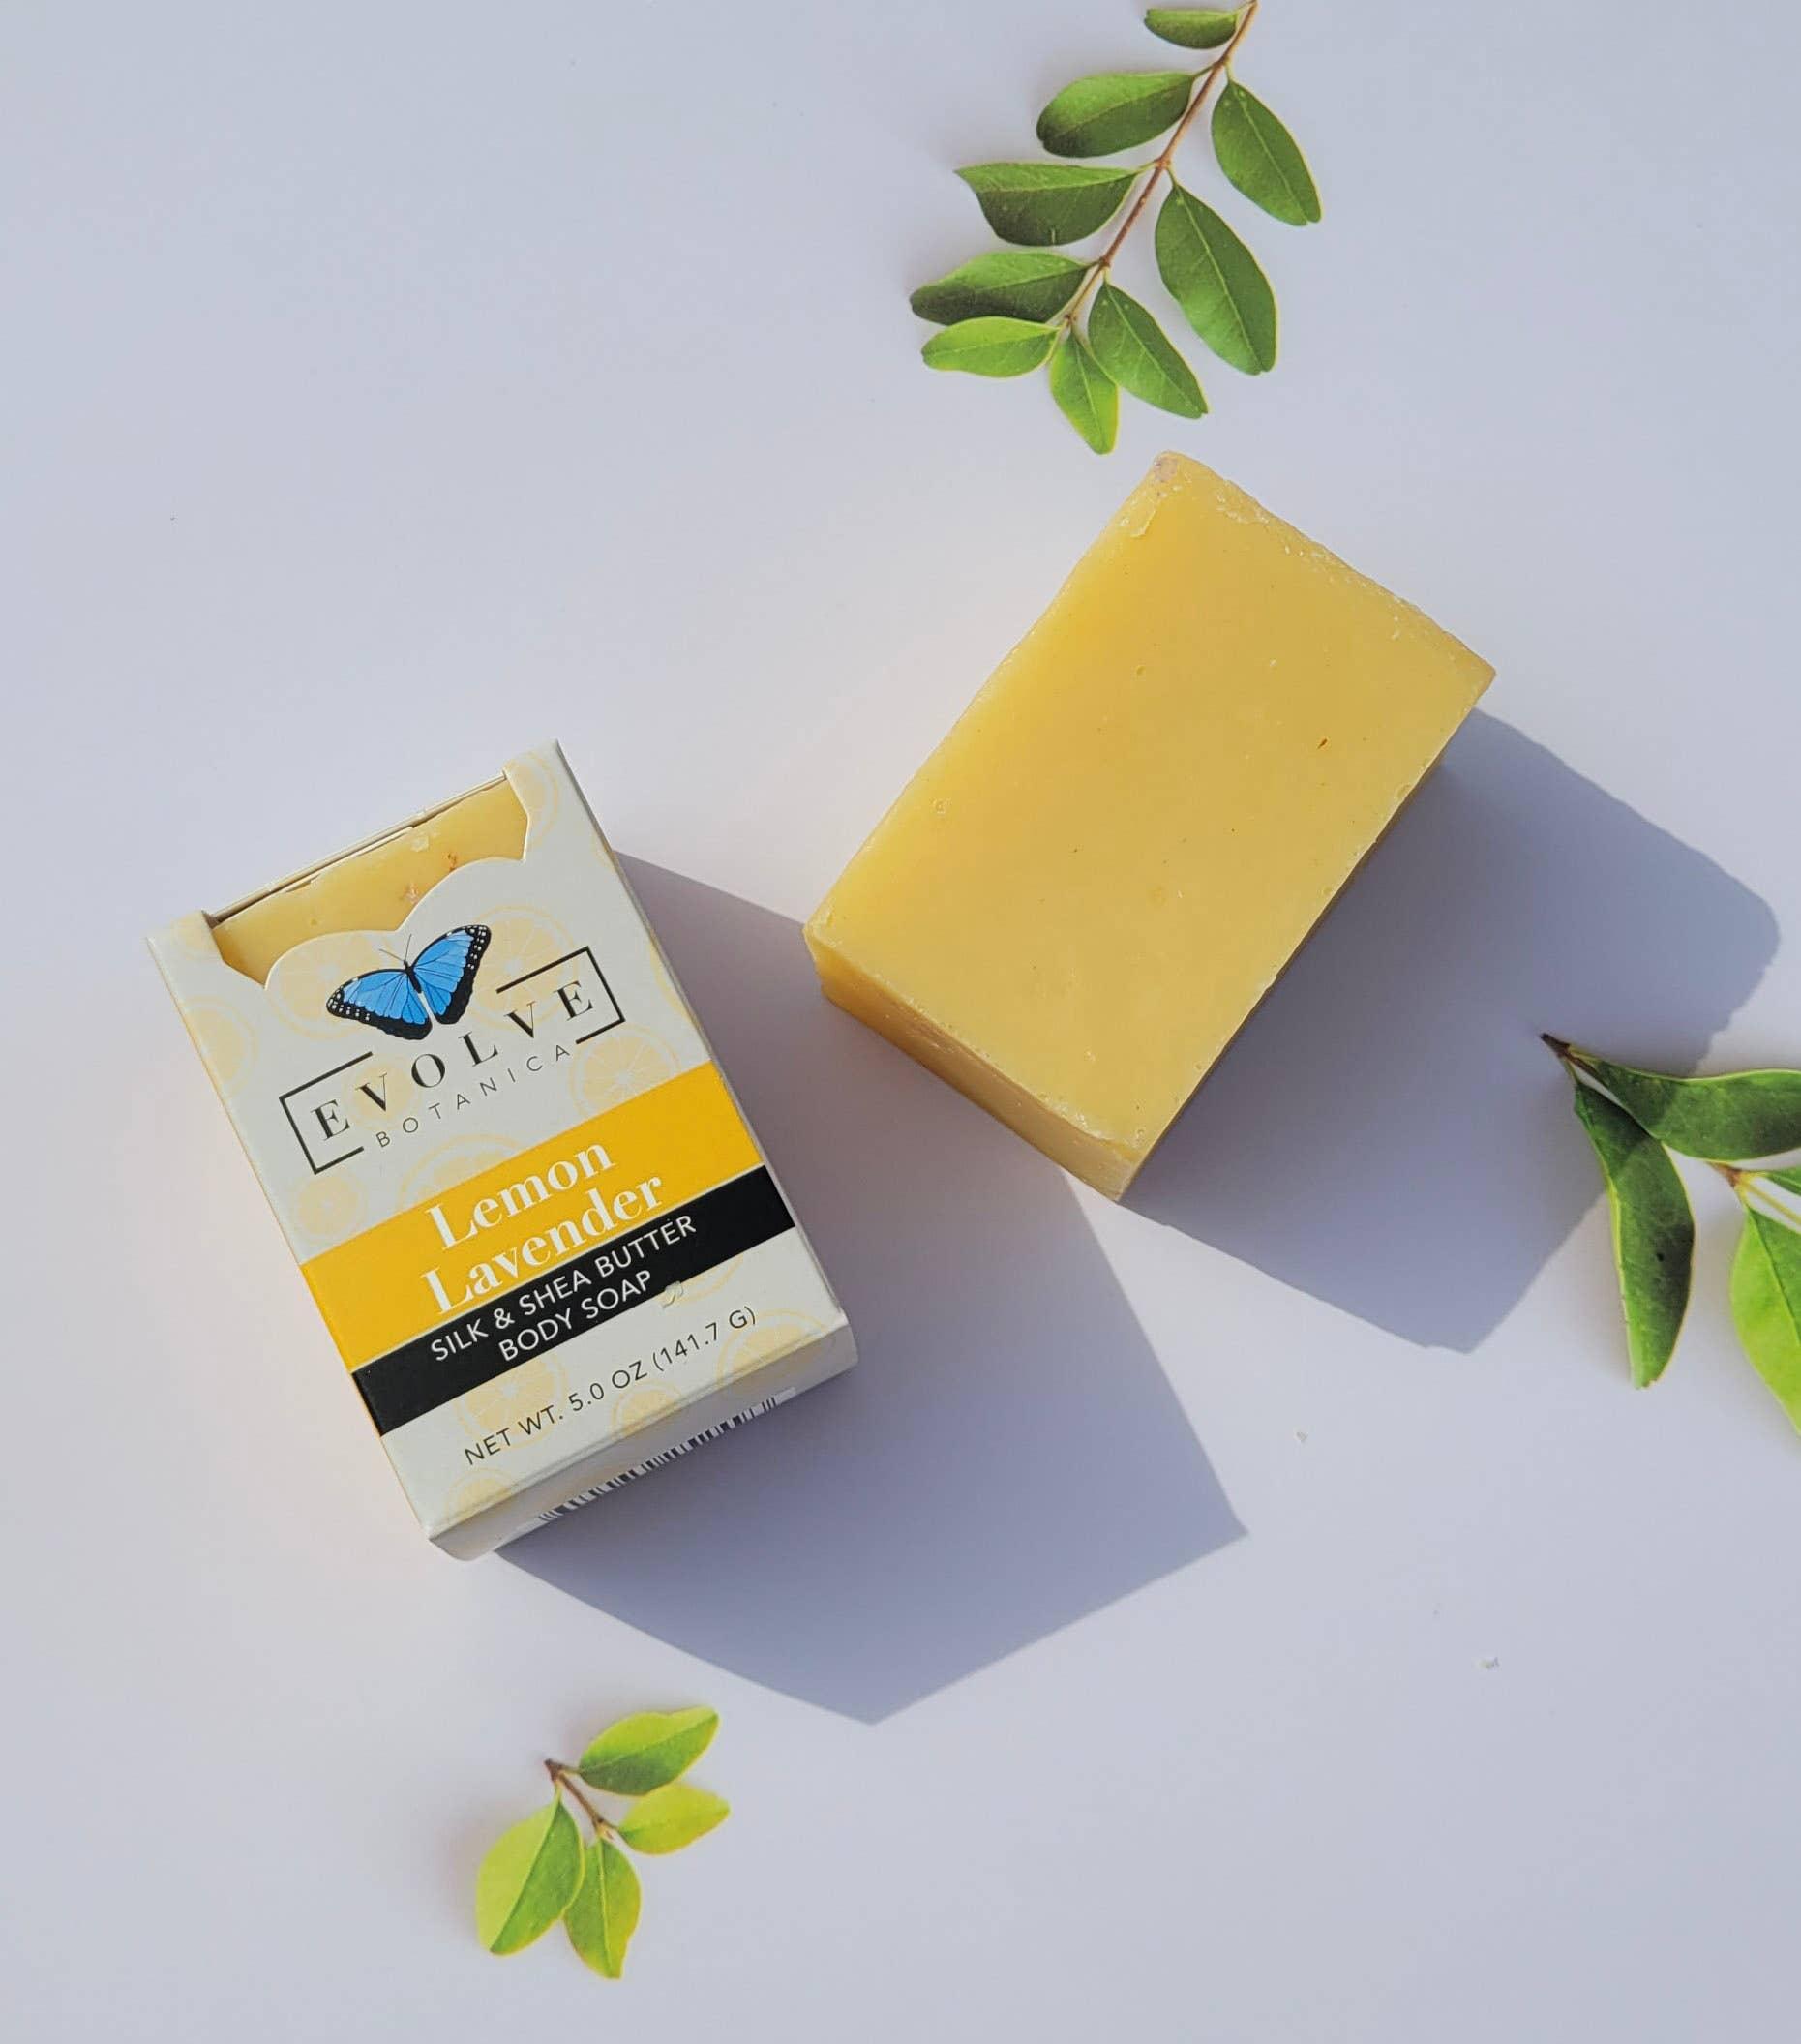 Evolve - Specialty Soap - Lemon Lavender Silk | Trada Marketplace